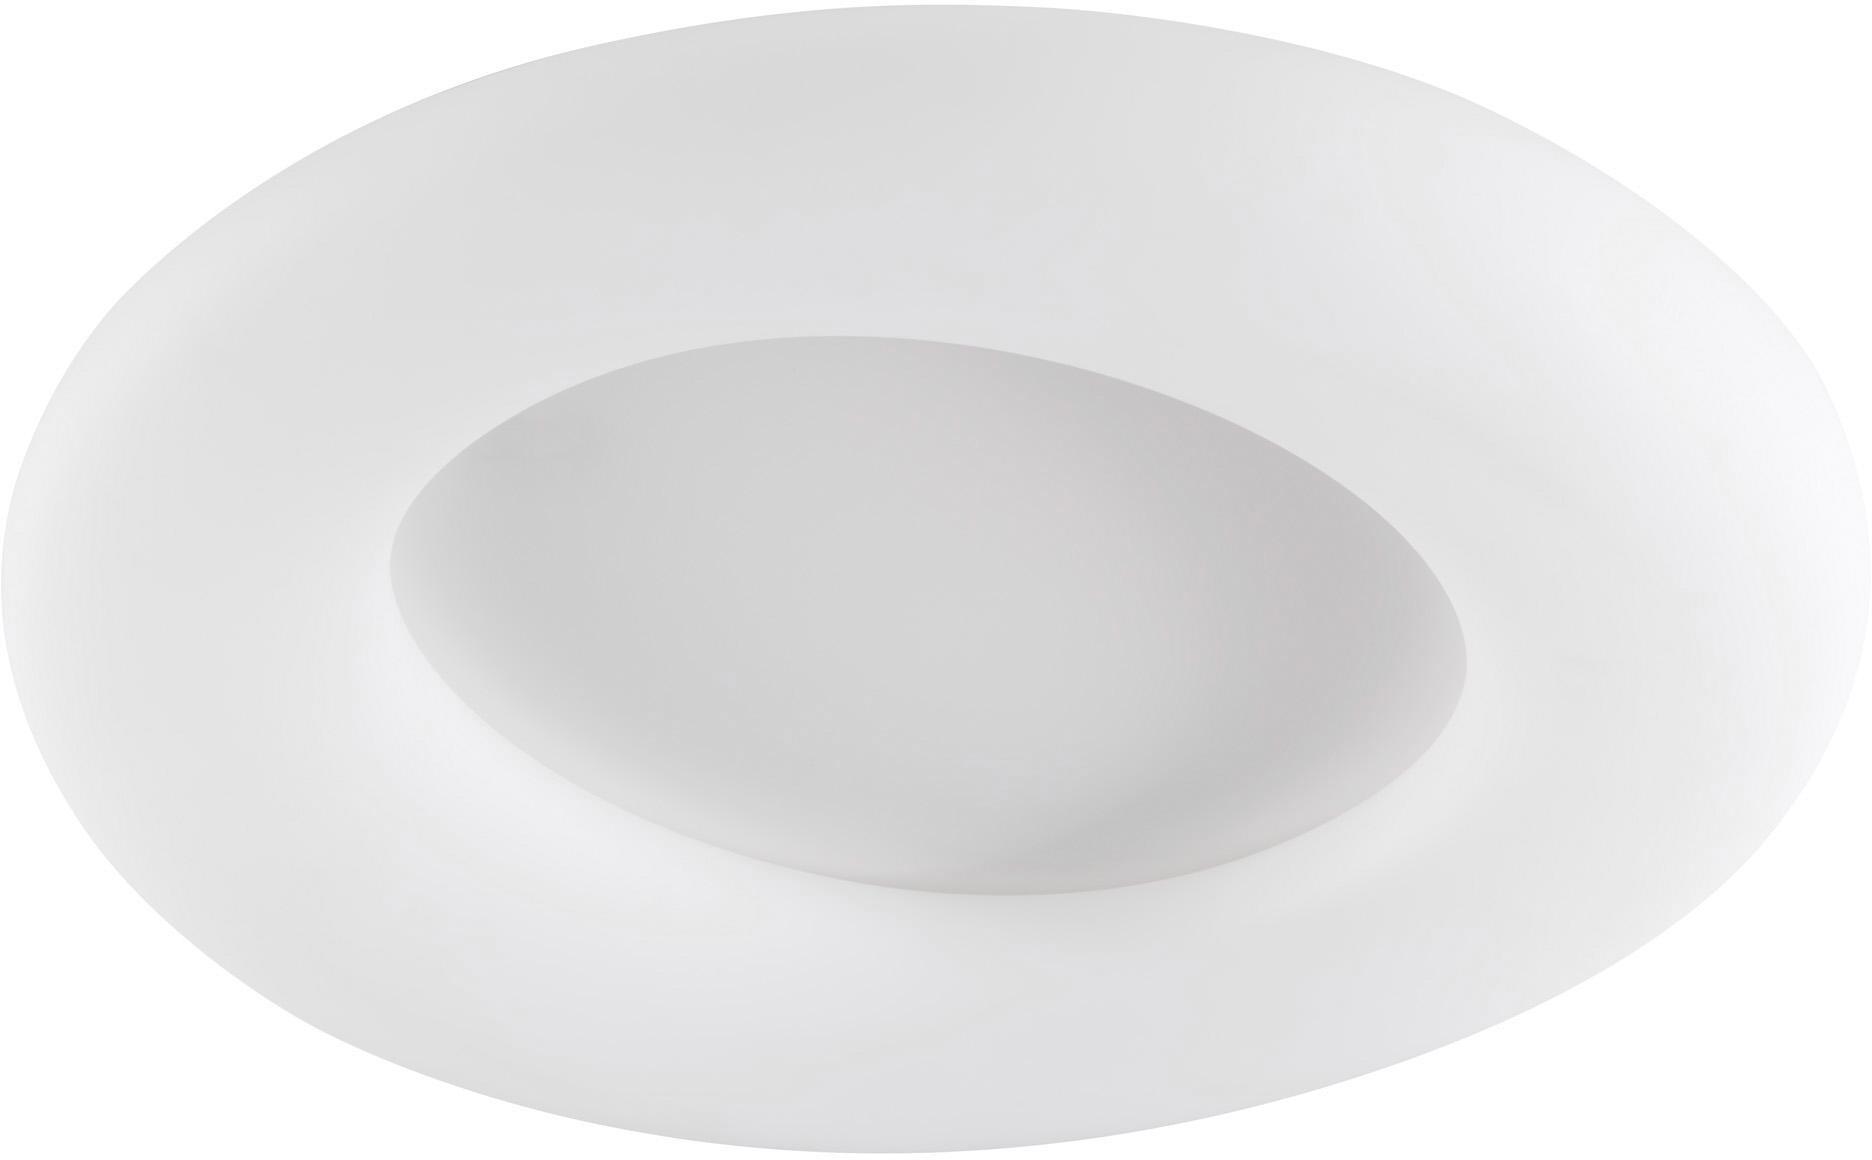 WOFI LED Deckenleuchte COUNTY, LED-Board, Warmweiß-Tageslichtweiß-Neutralweiß-Kaltweiß, LED Deckenlampe